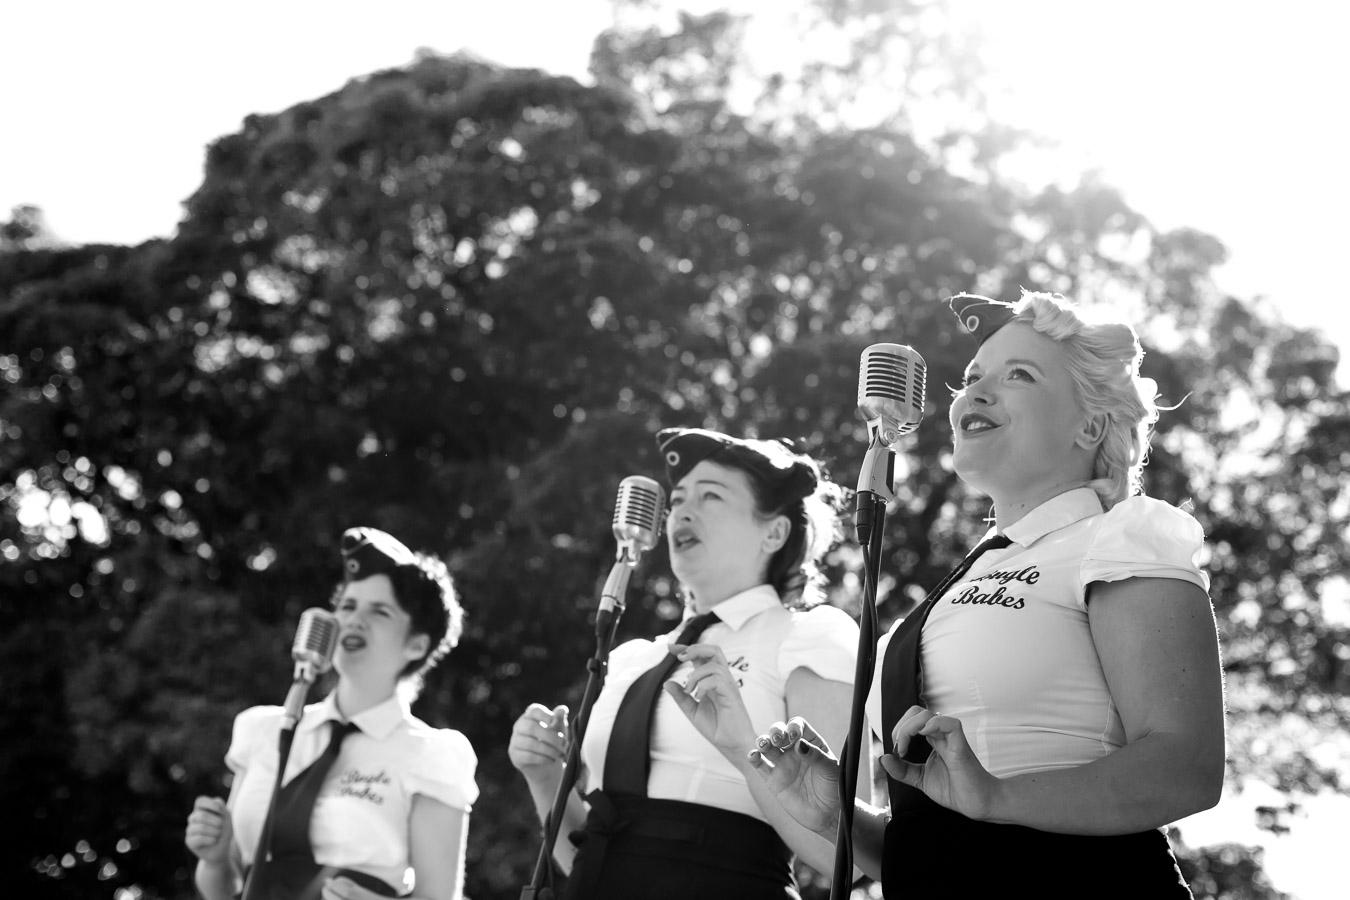 bugle babes wedding band